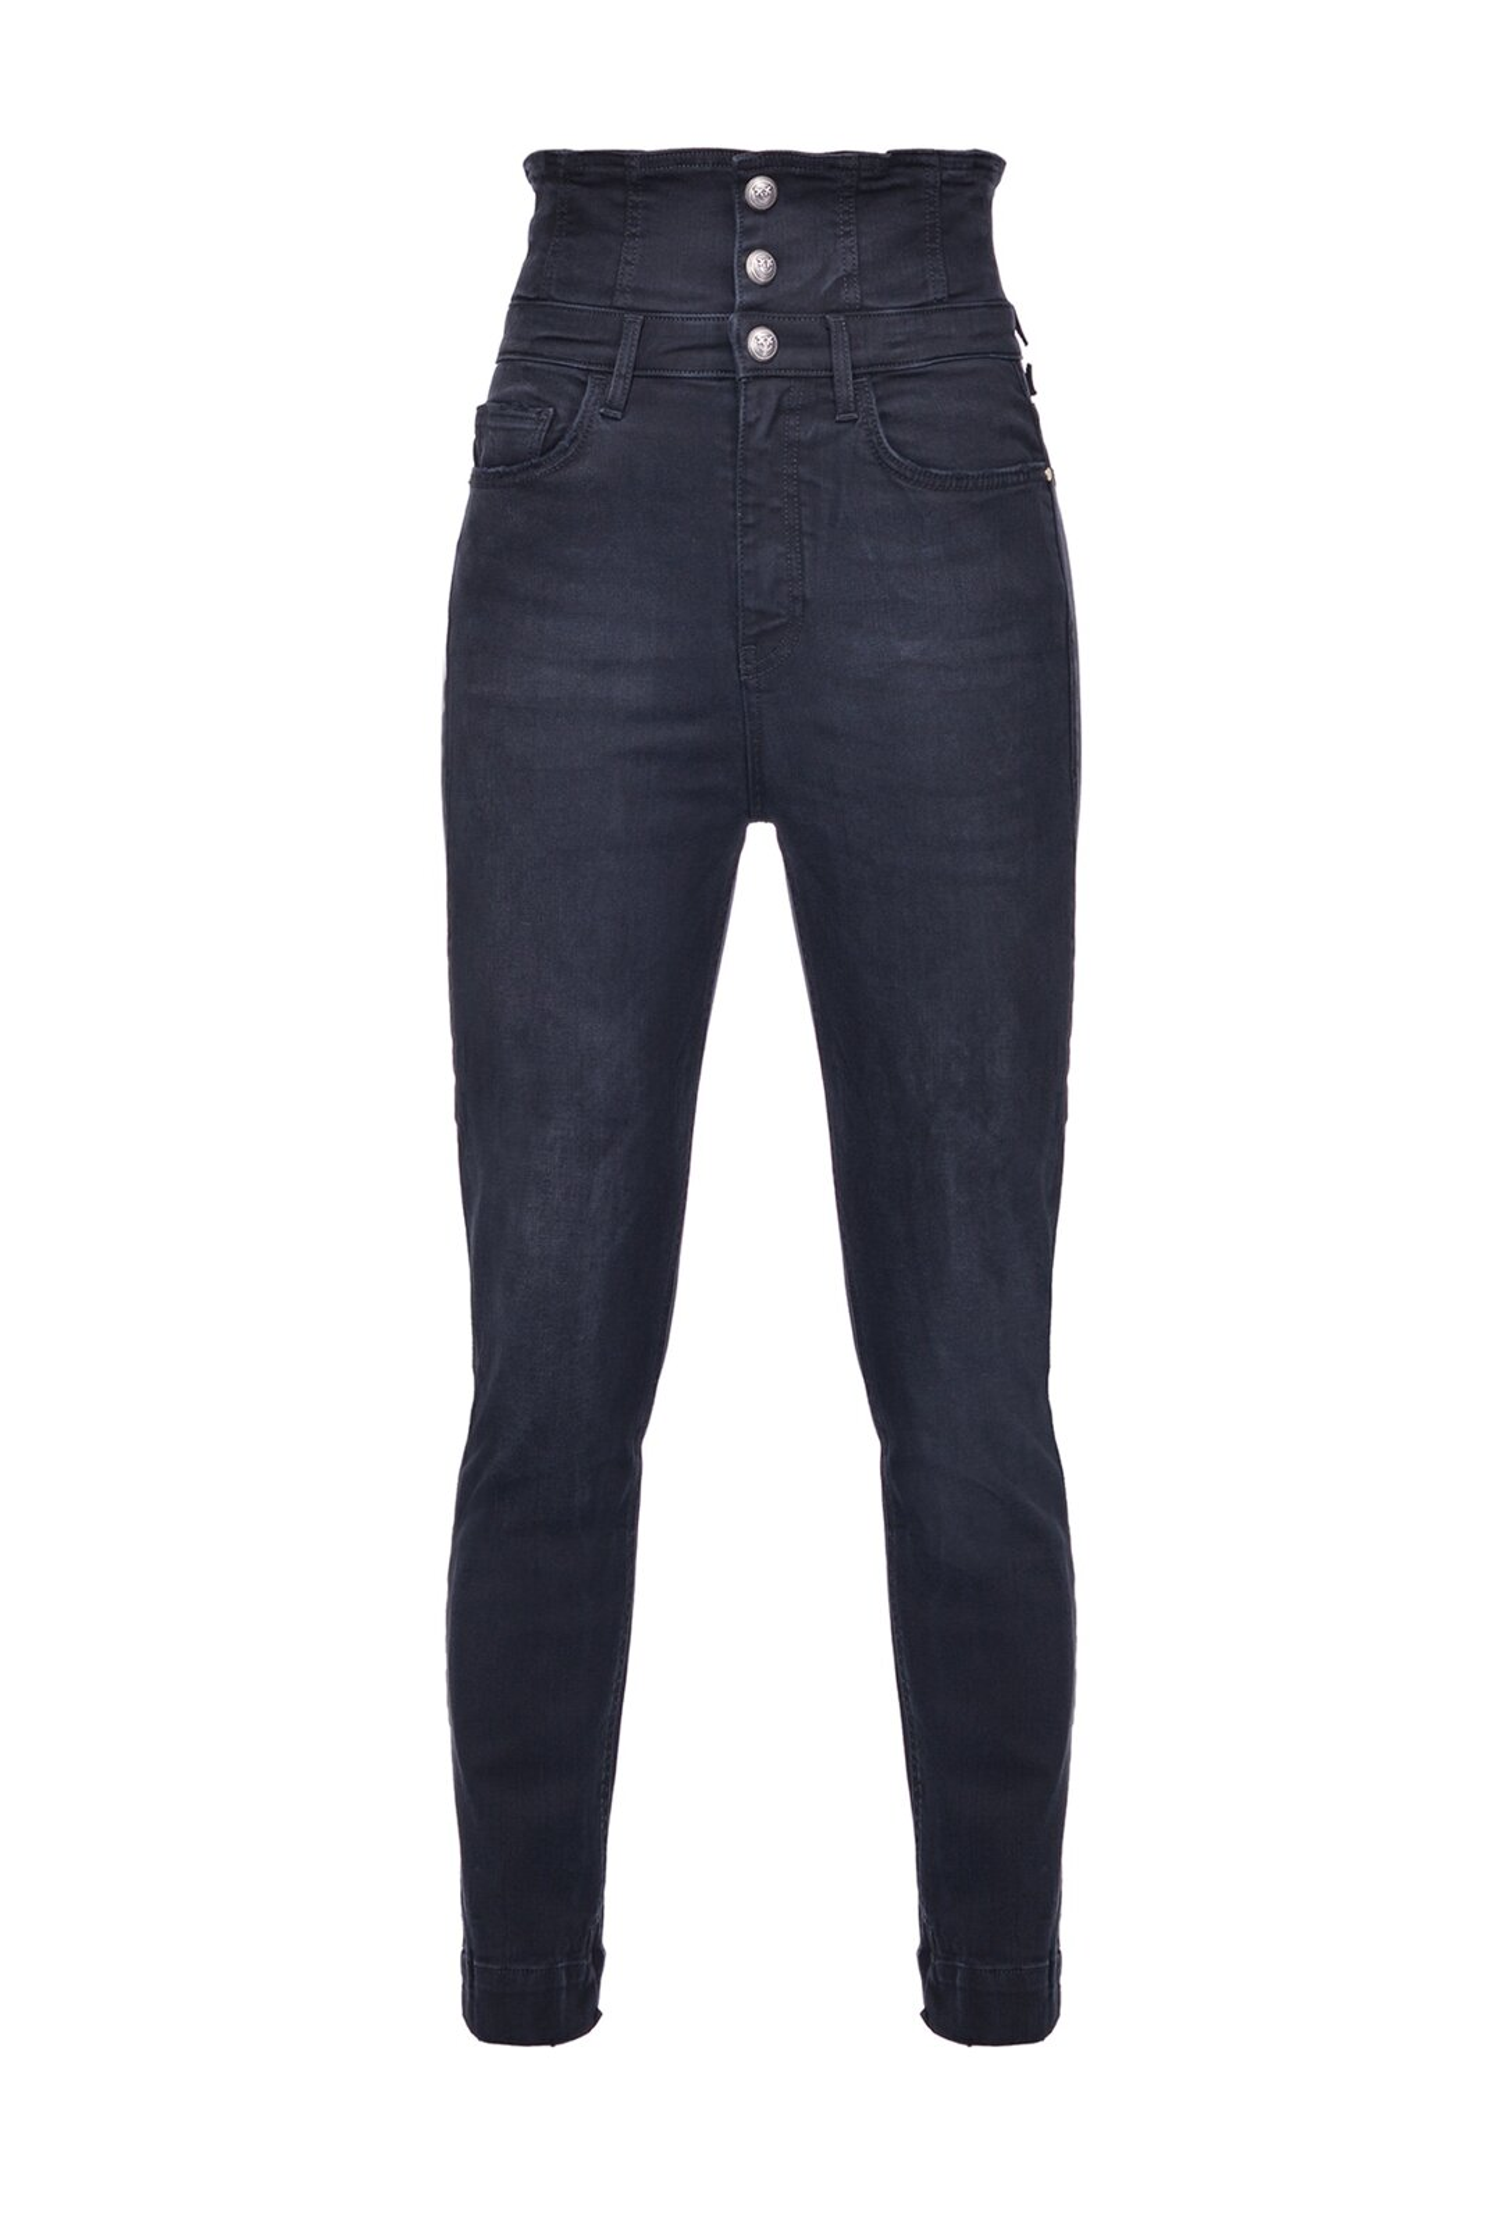 Jeans Skinny Super Alti In Denim Power Stretch Black - Pinko